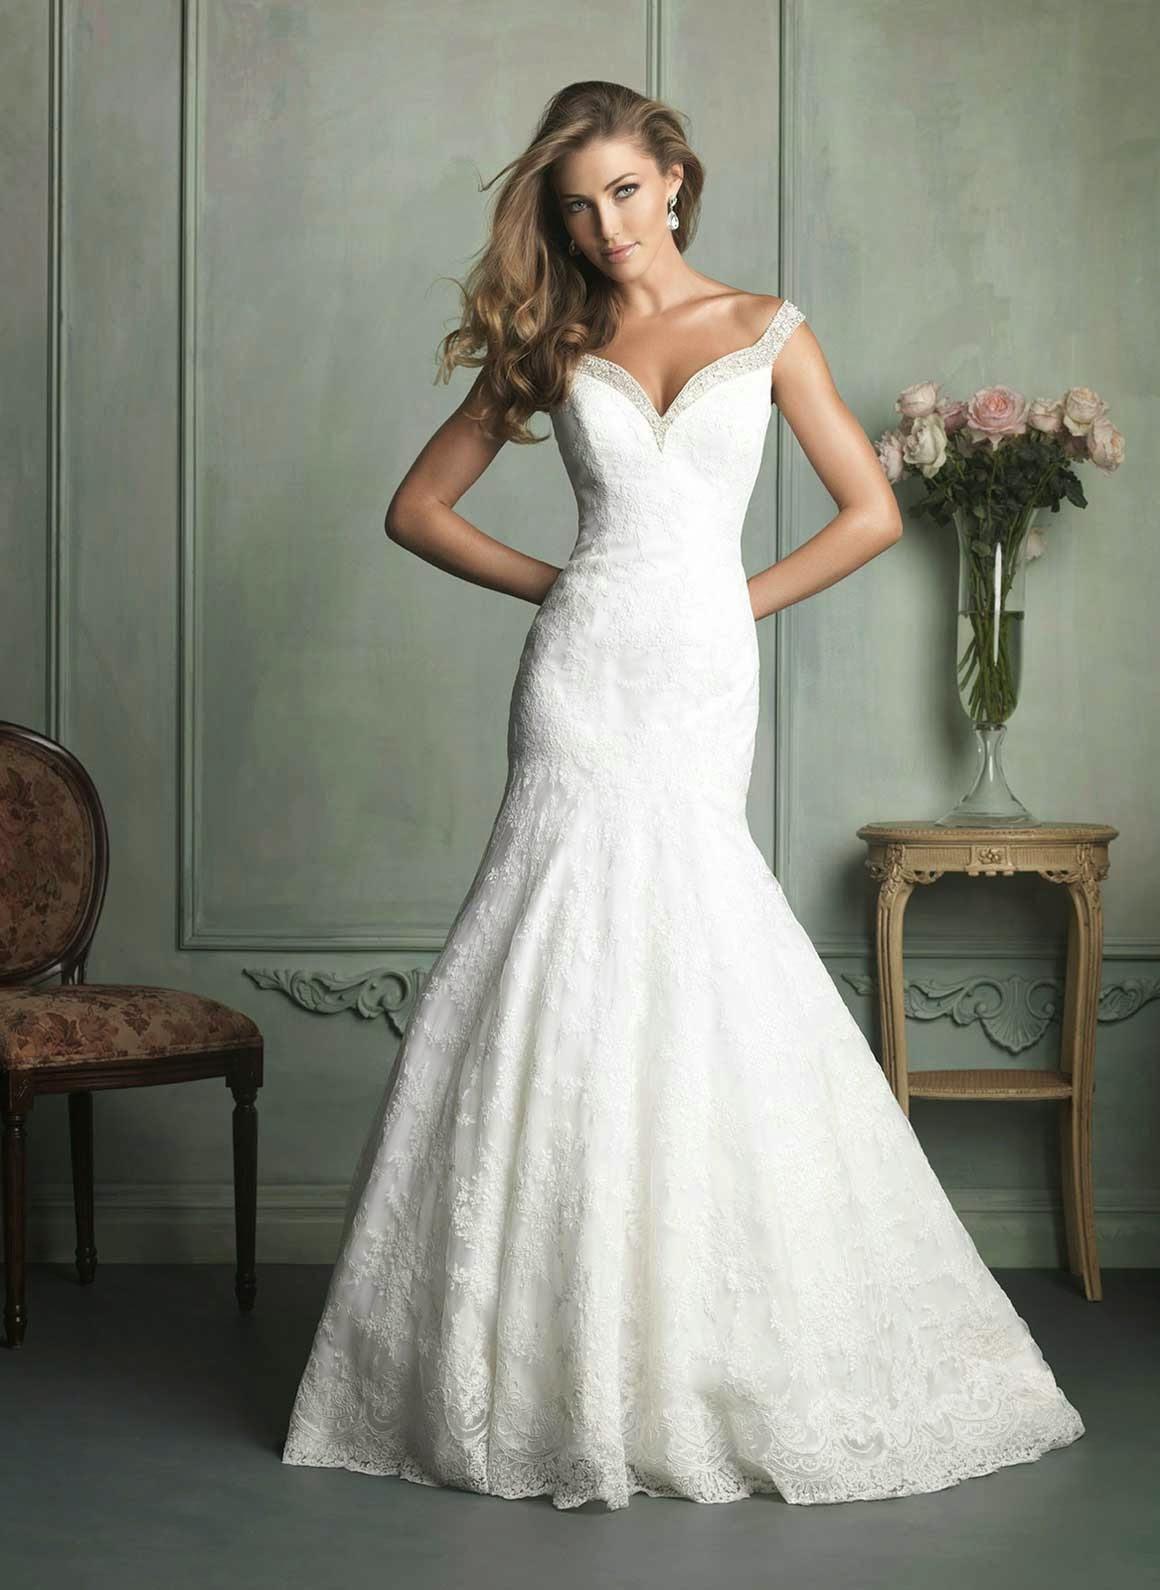 White Wedding Dresses UK Photos HD Concepts Ideas